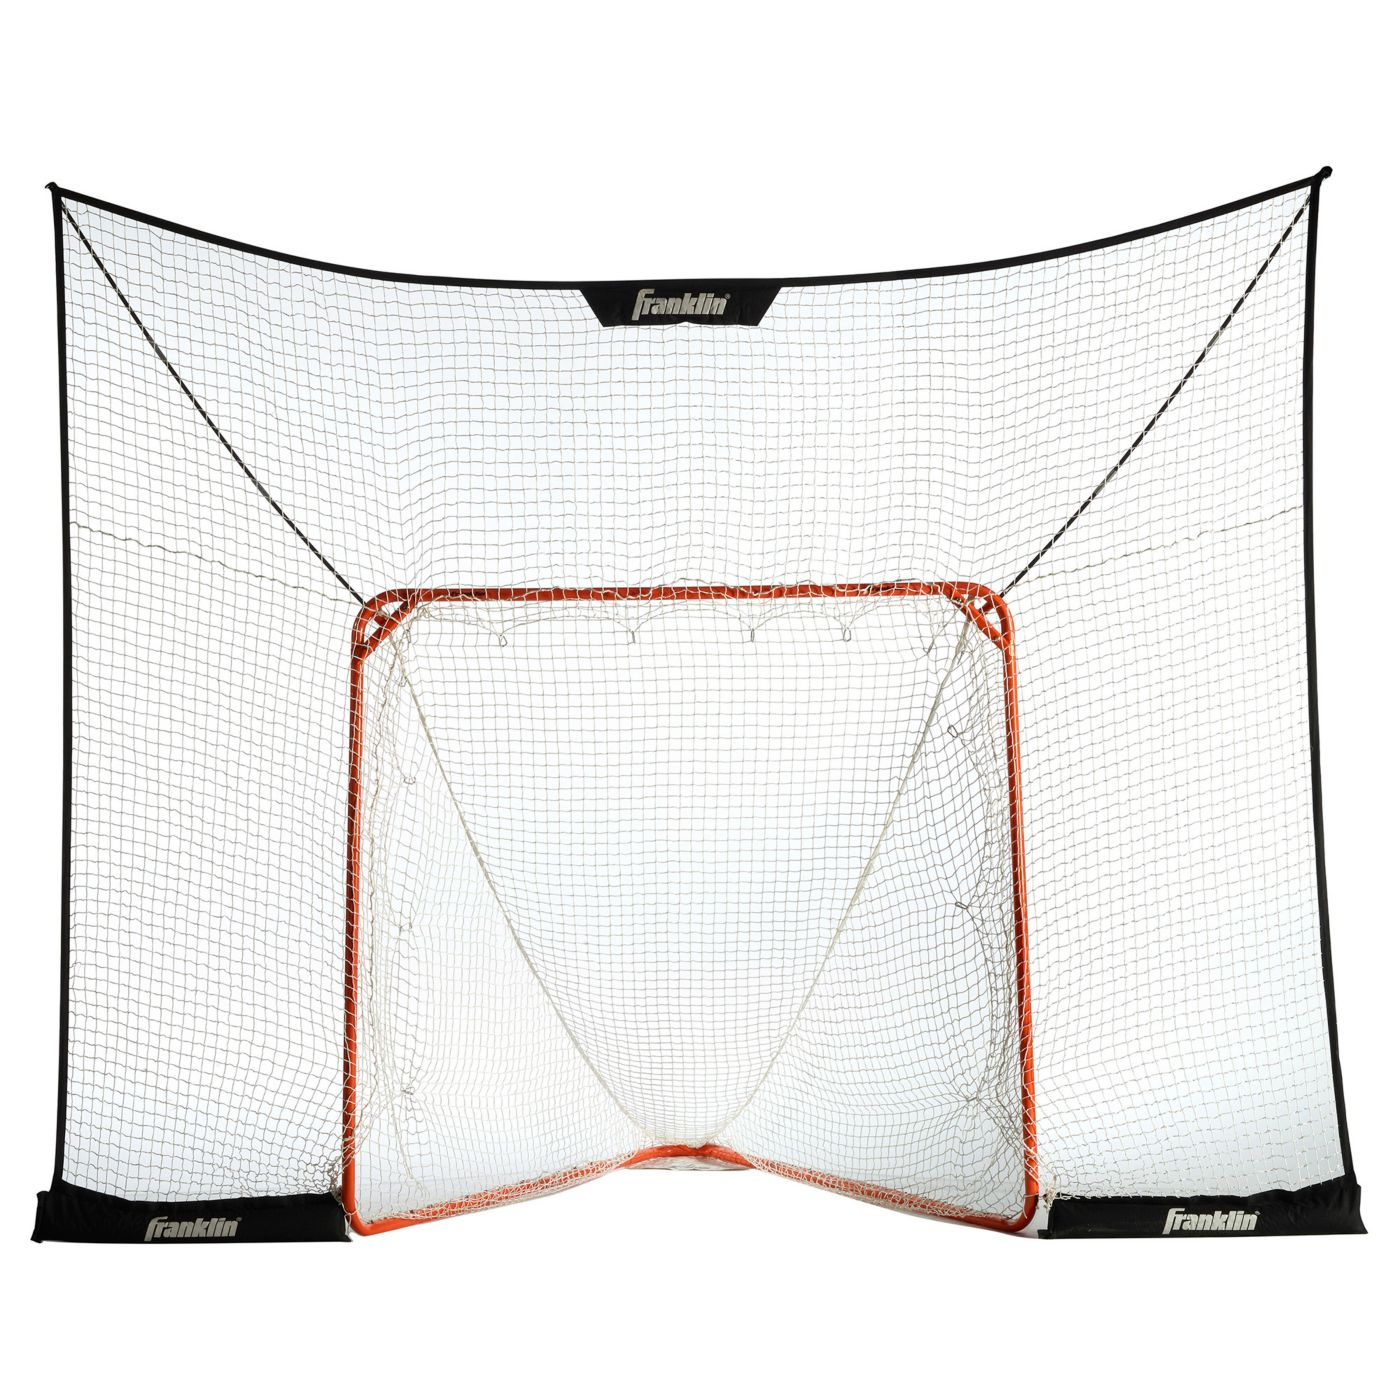 Franklin Fiber-Tech Lacrosse Goal Backstop